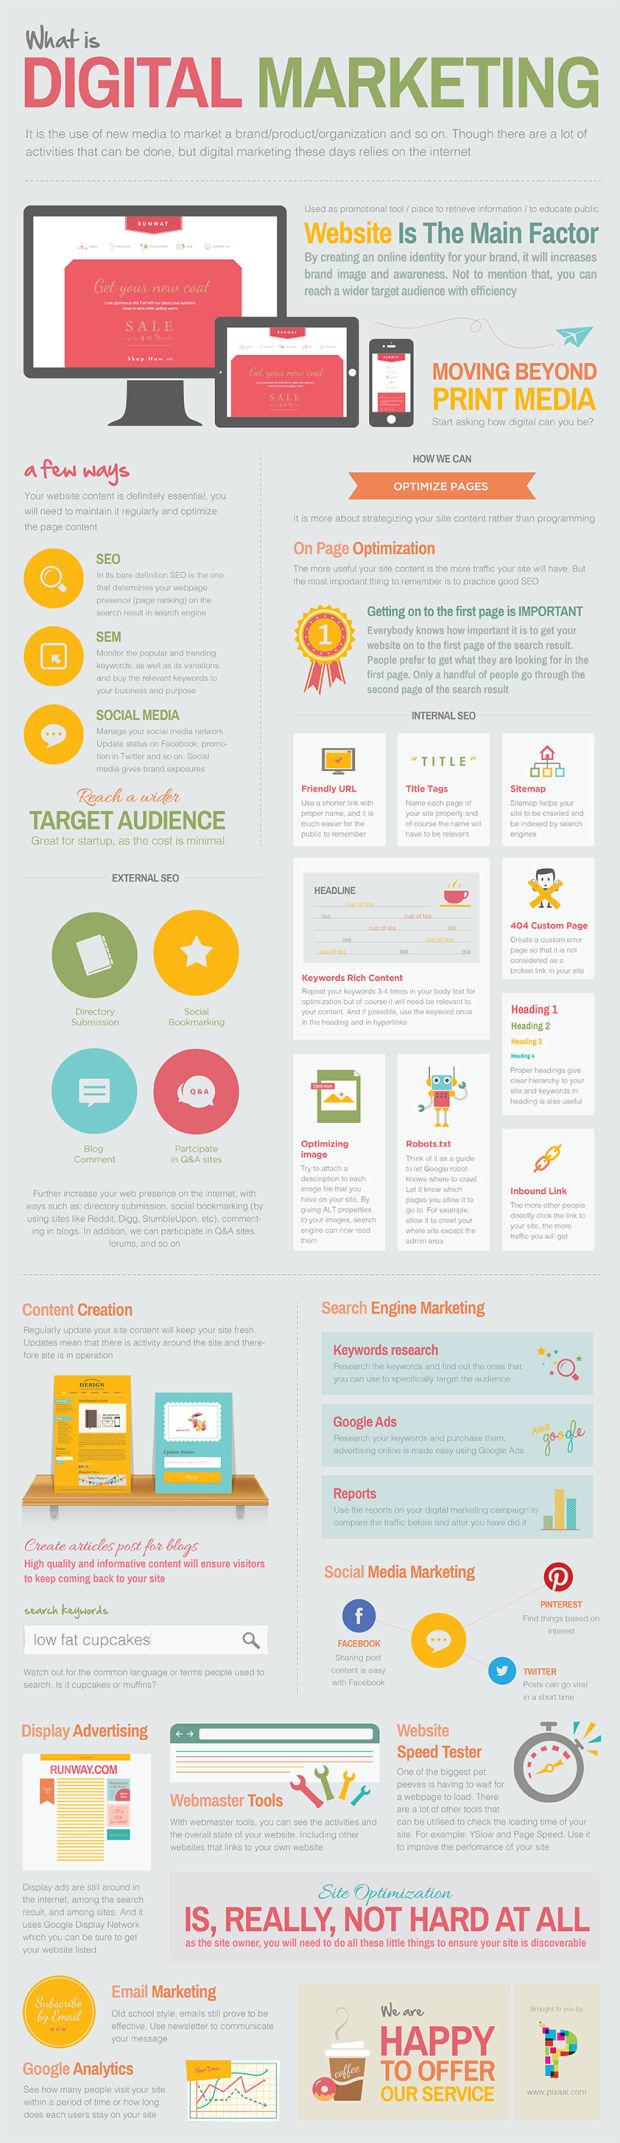 Digital Marketing Infographic.jpg